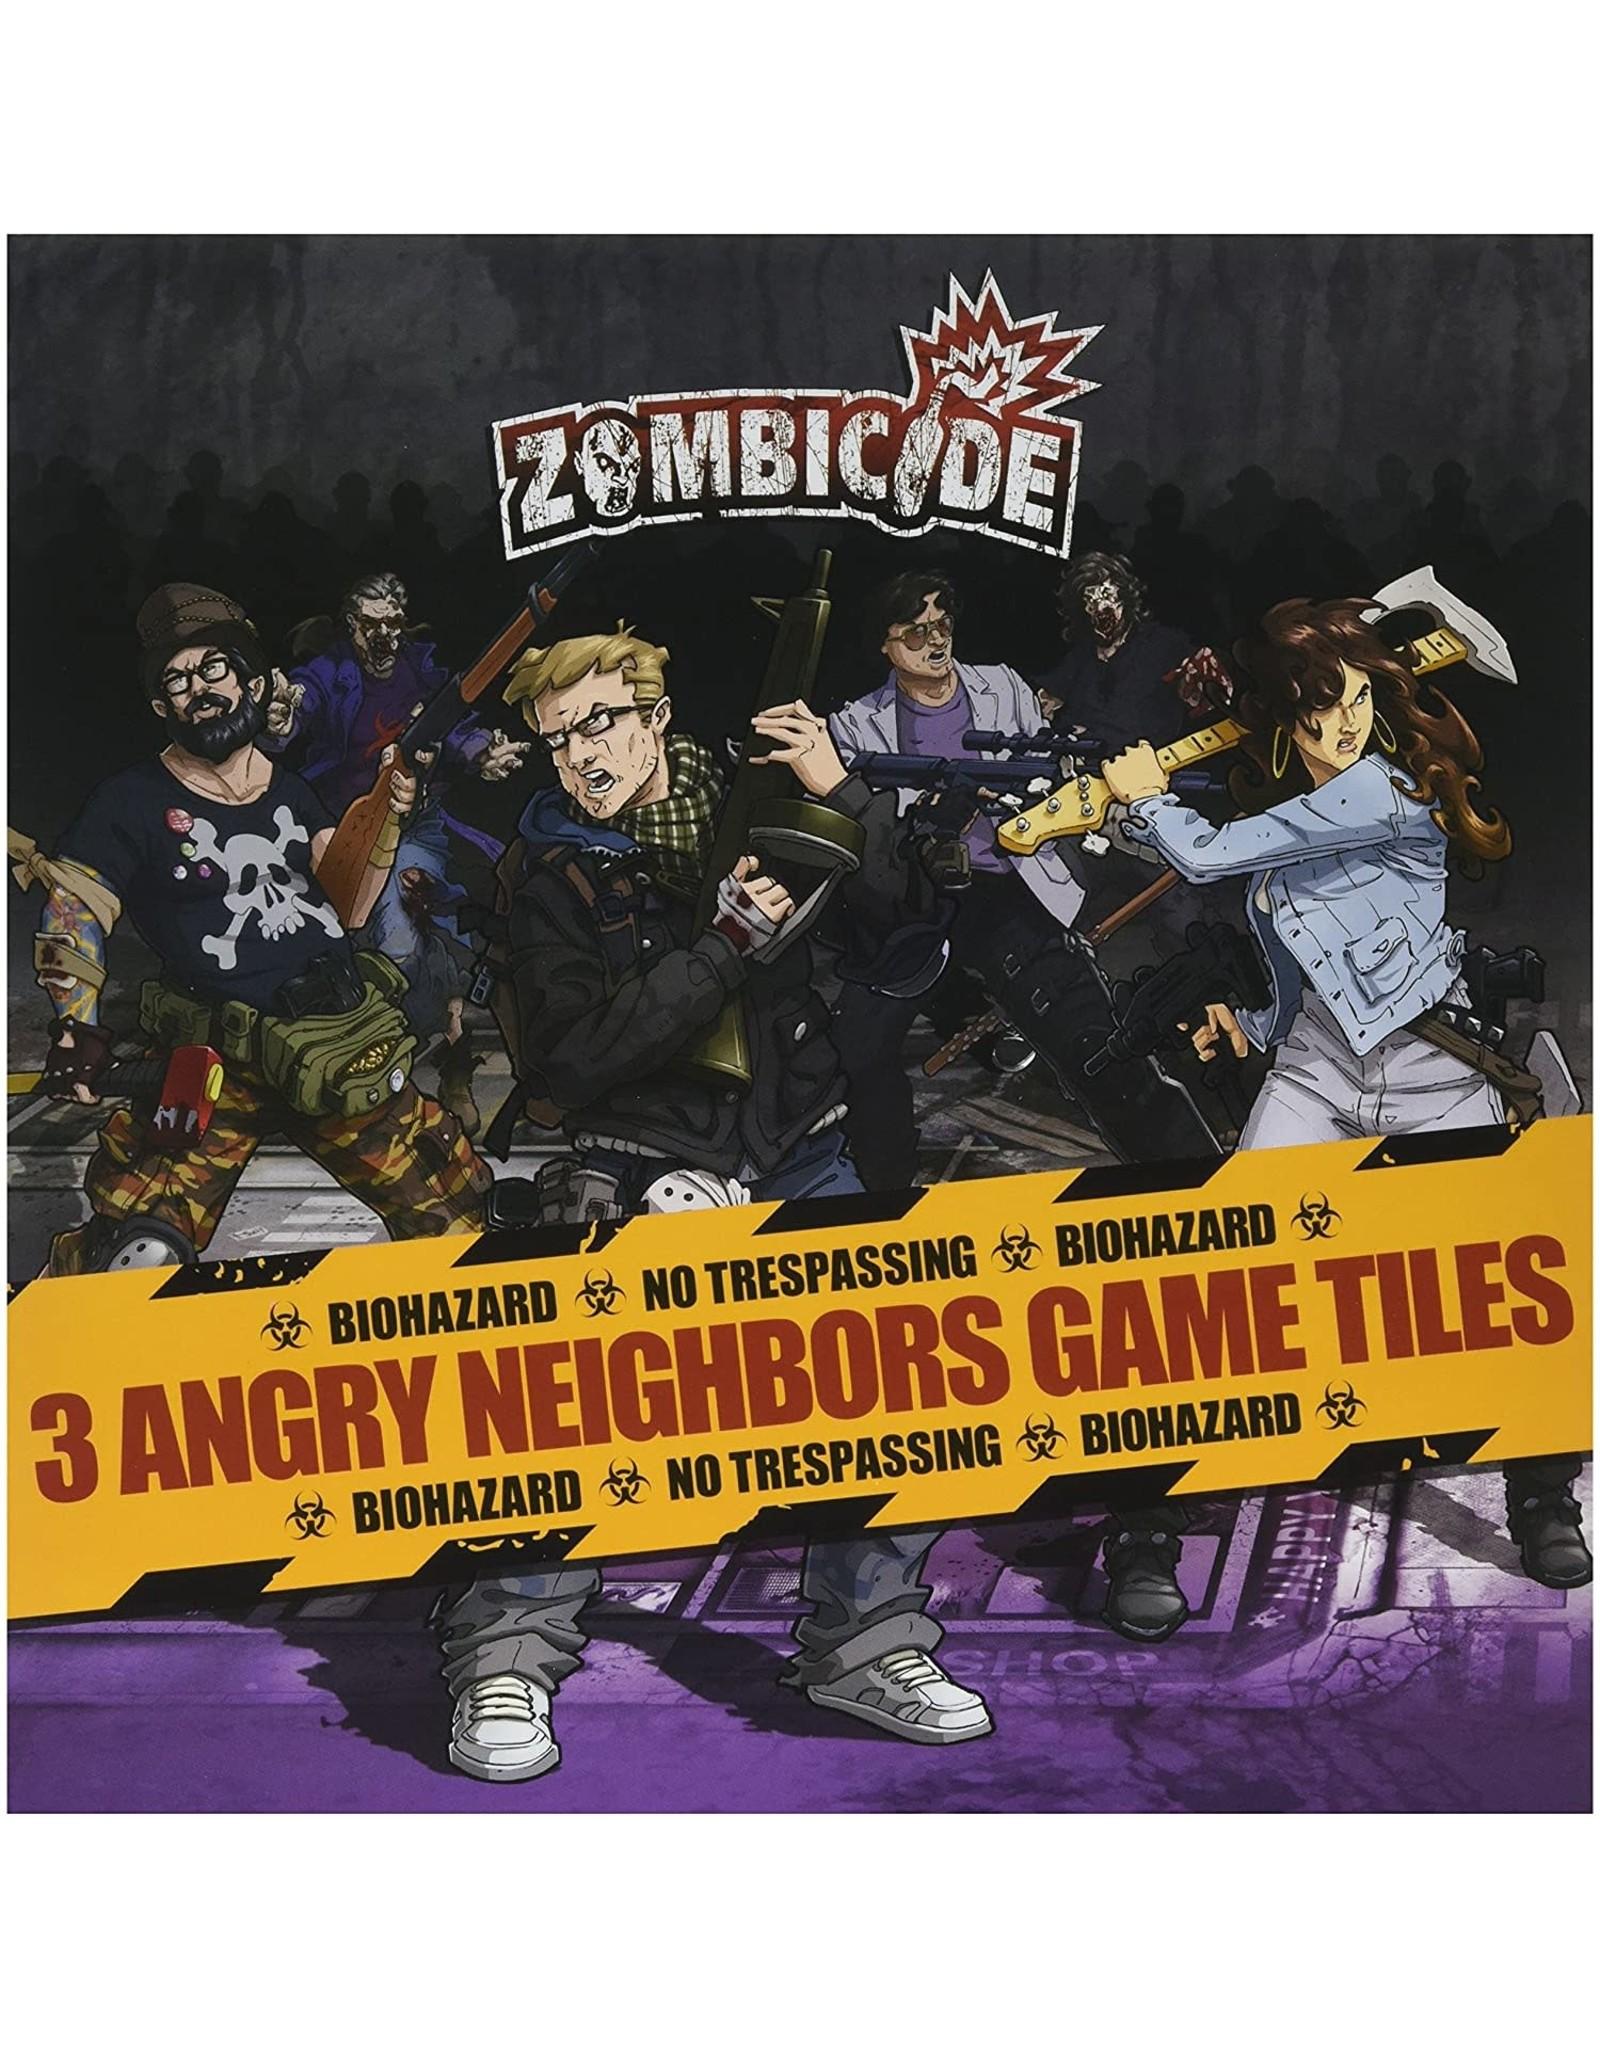 Zombicide Angry Neighbors 3 Game Tiles